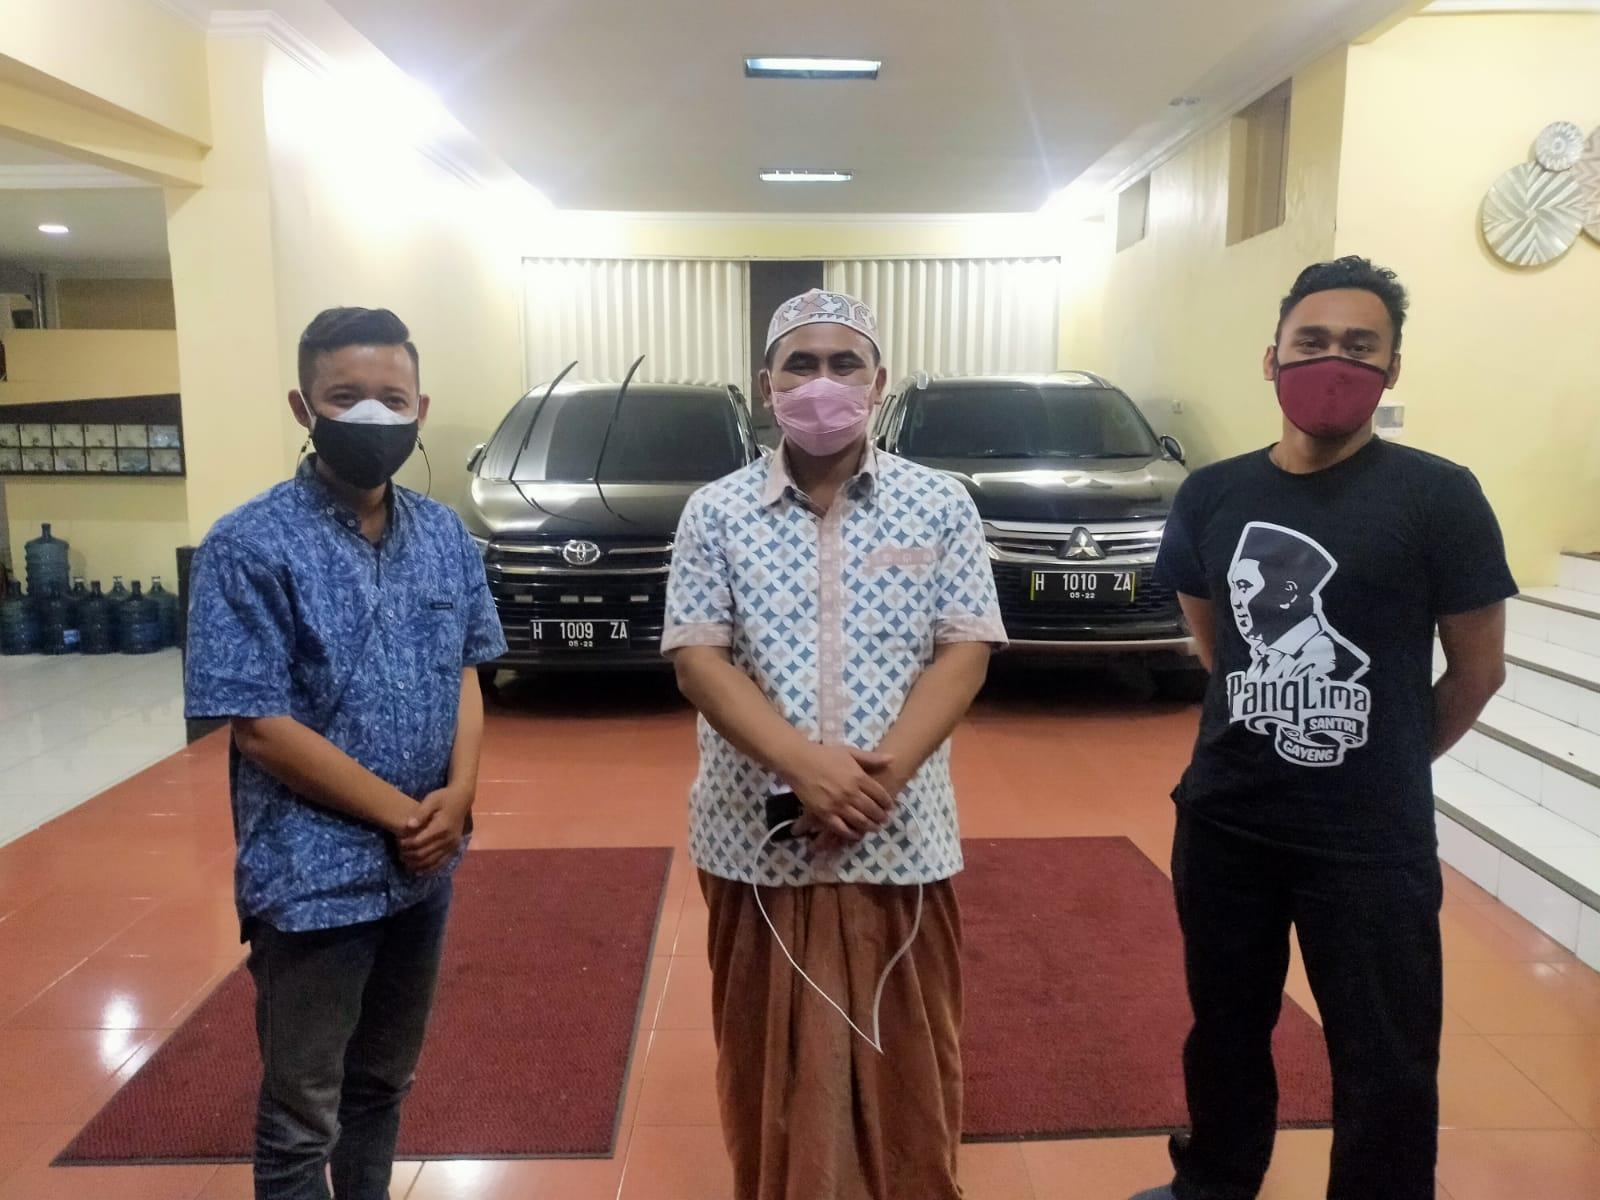 Wagub jateng saat dikunjungi Tim Lingkar.co di rumah dinasnya. FOTO: Rezanda Akbar D./LINGKAR.CO